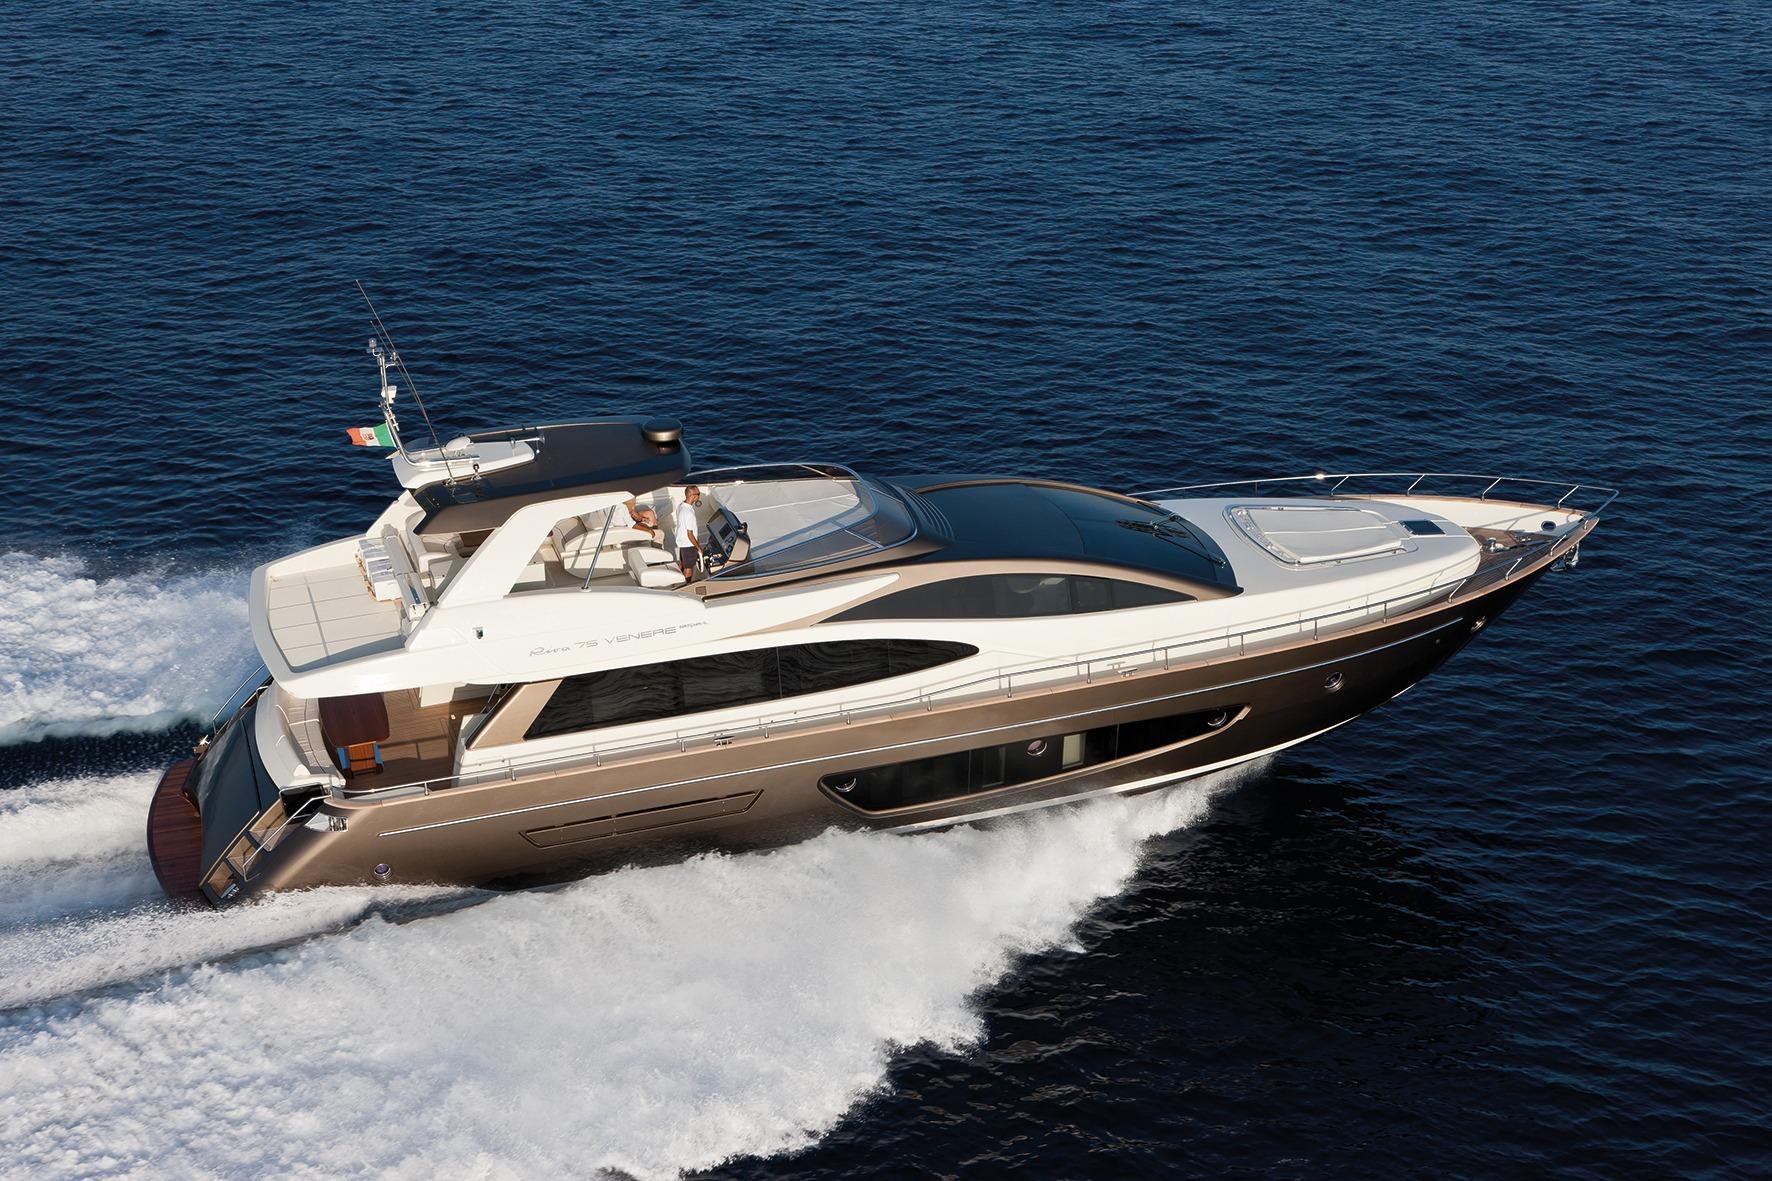 Manufacturer Provided Image: Riva 75' Venere Super Side View